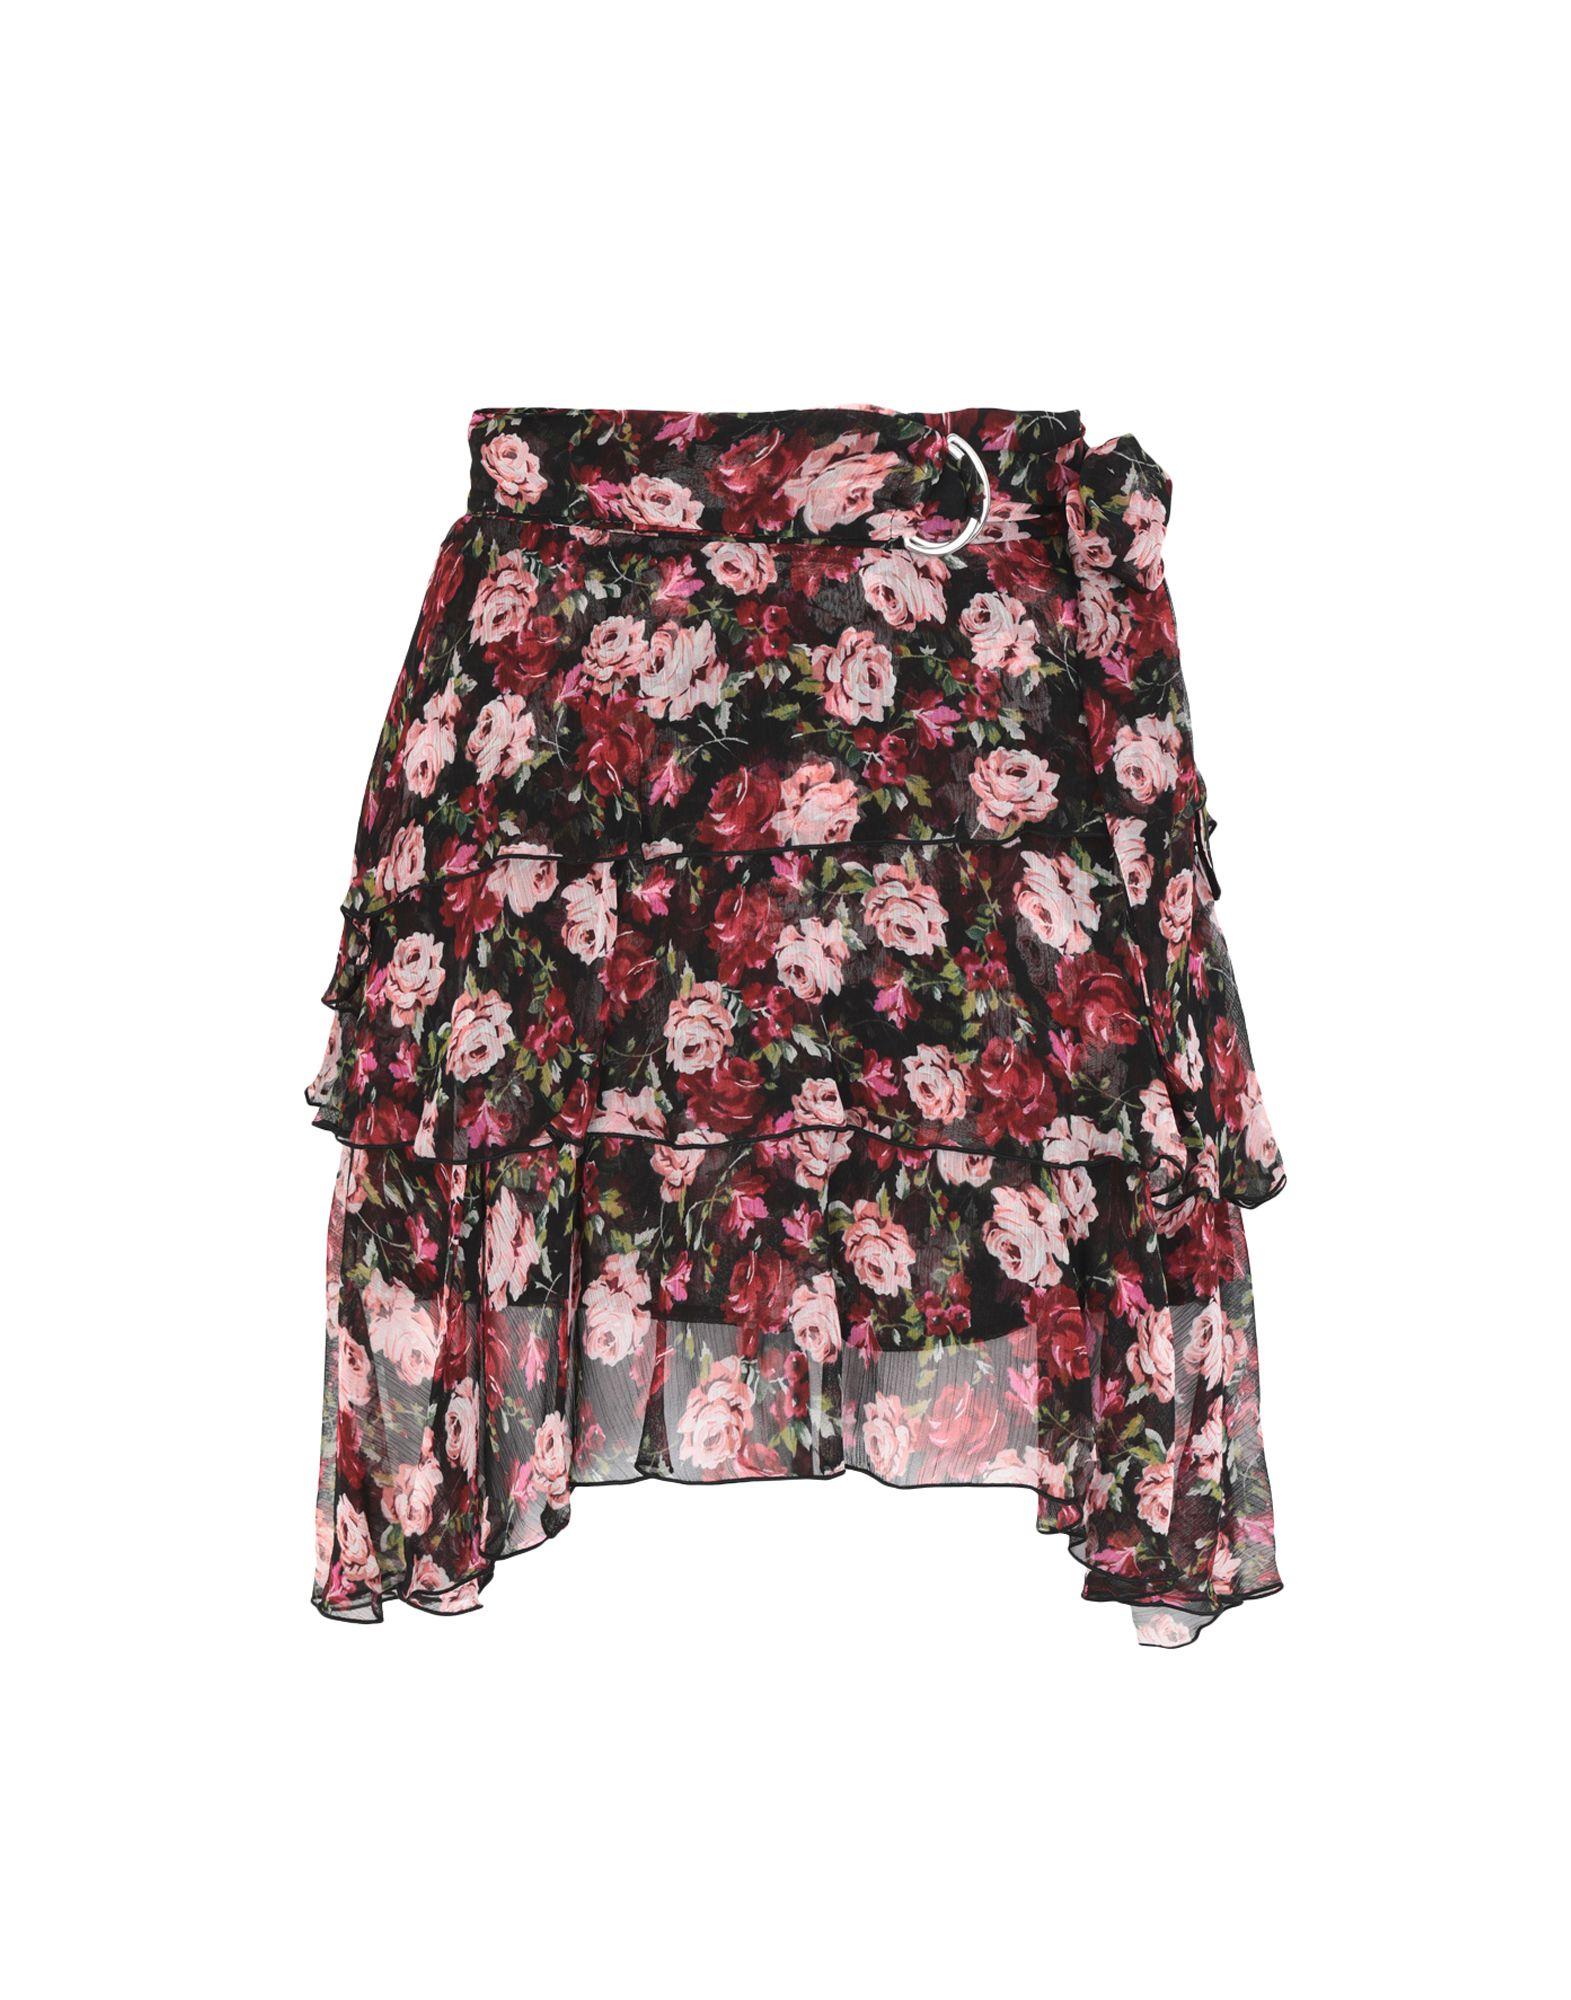 THE KOOPLES SPORT Мини-юбка sport dress katrus платья и сарафаны мини короткие